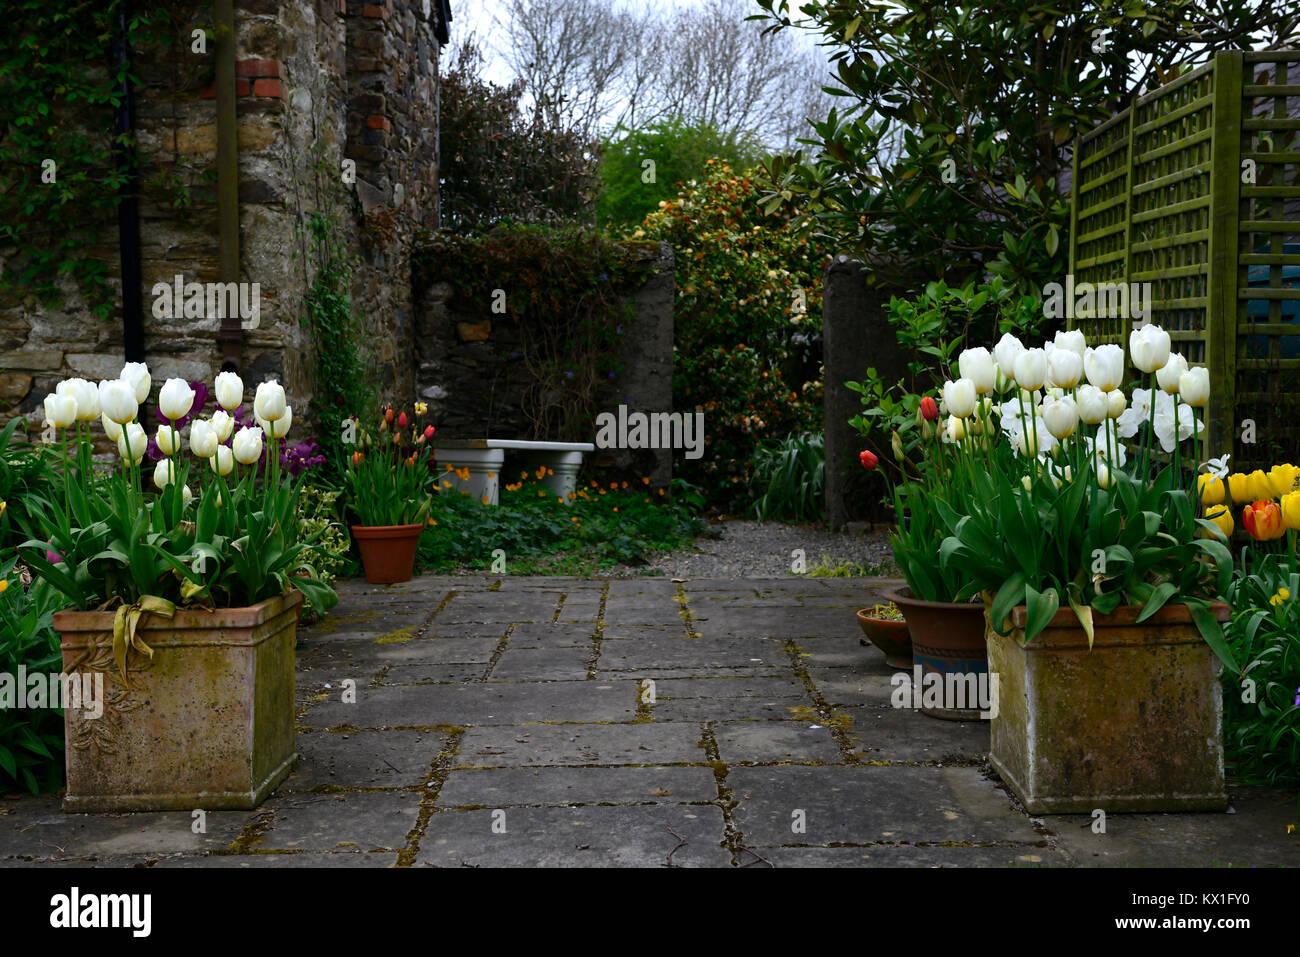 Tulipa Angels Wishtuliptulips Stock Photo 170908836 Alamy